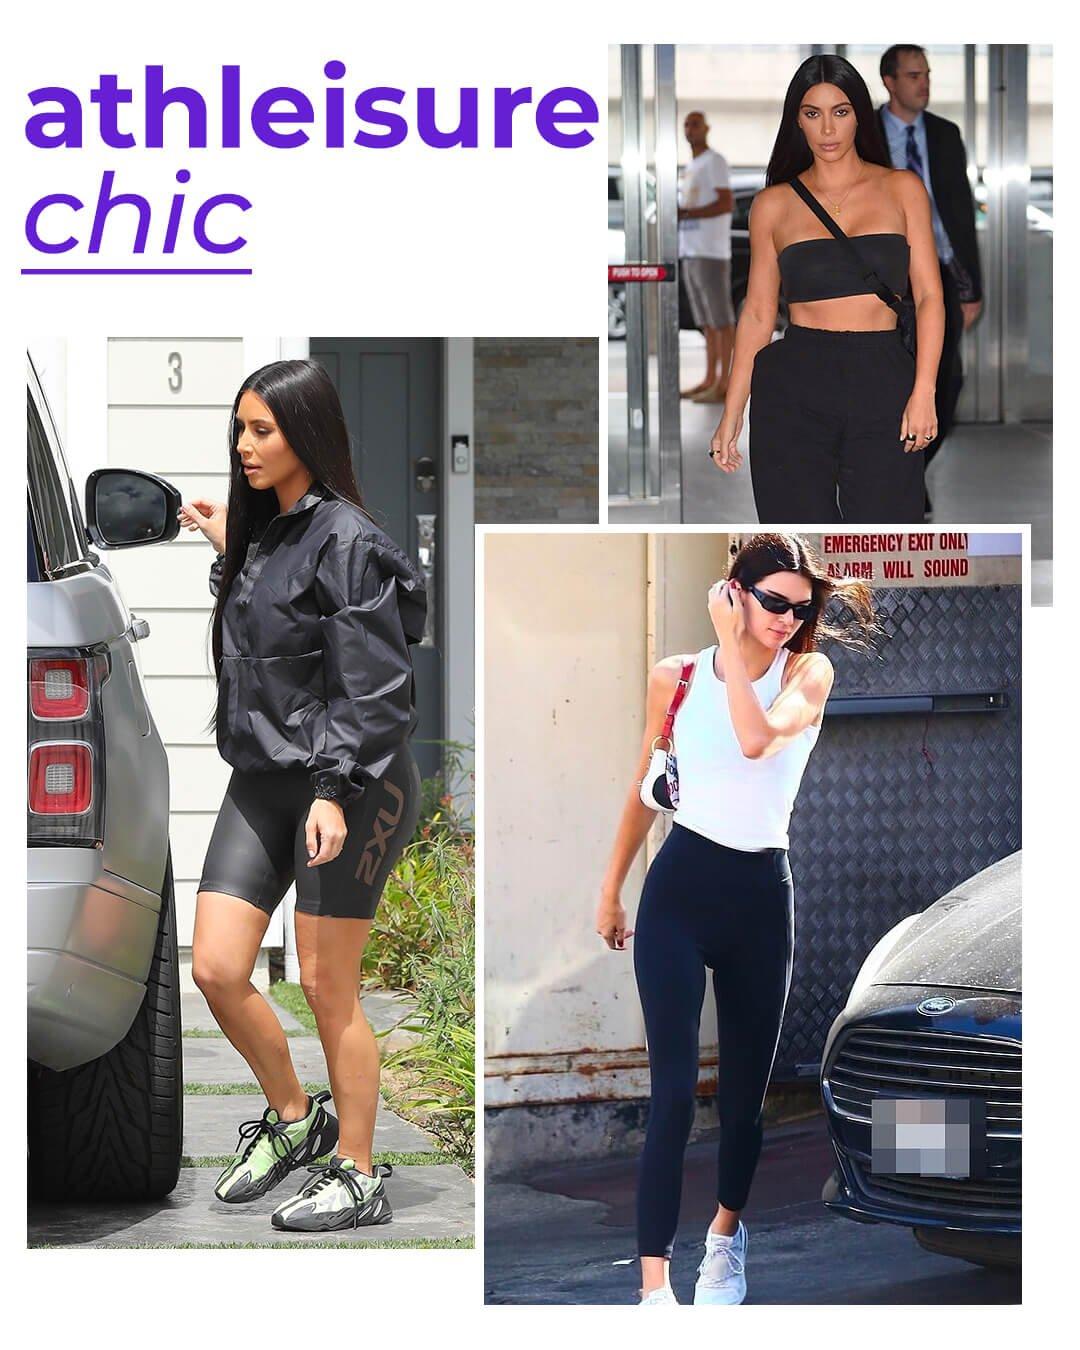 It girls - Athleisure - Kardashians - Verão - Street Style - https://stealthelook.com.br